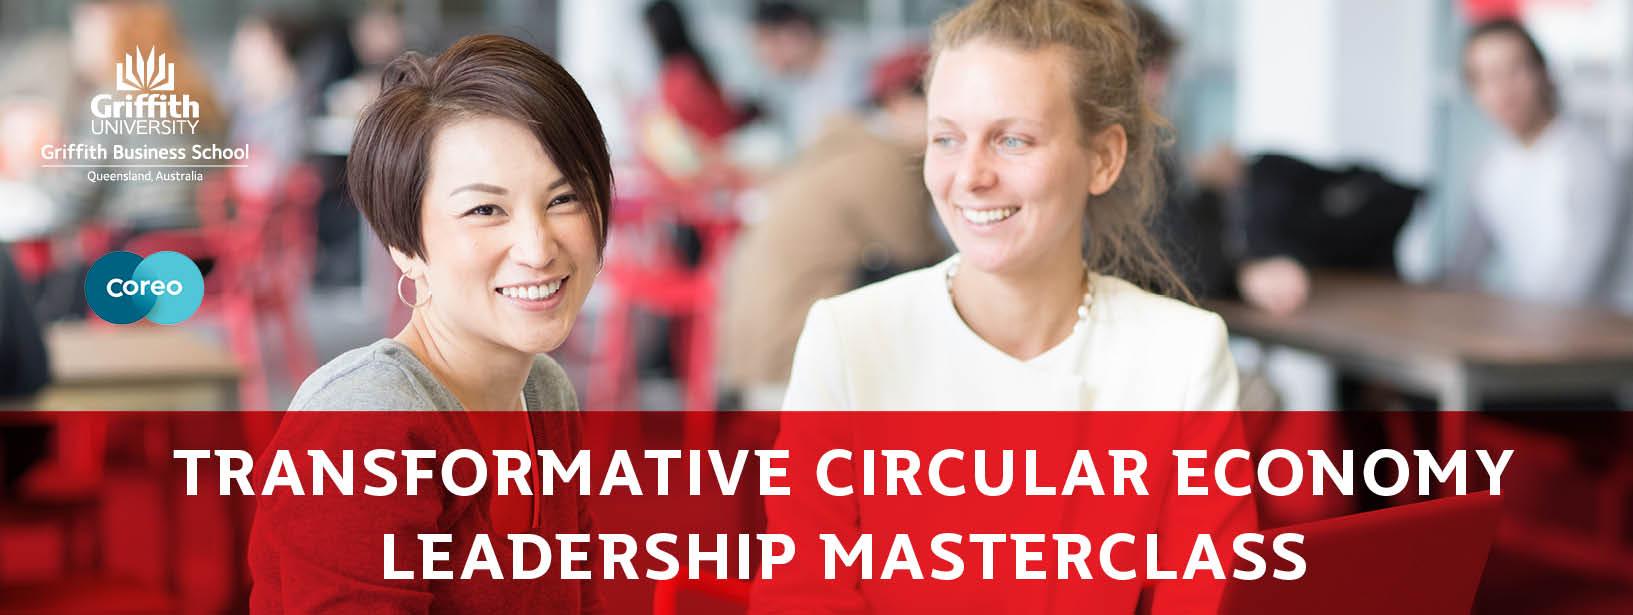 Circular Economy Leadership Masterclass